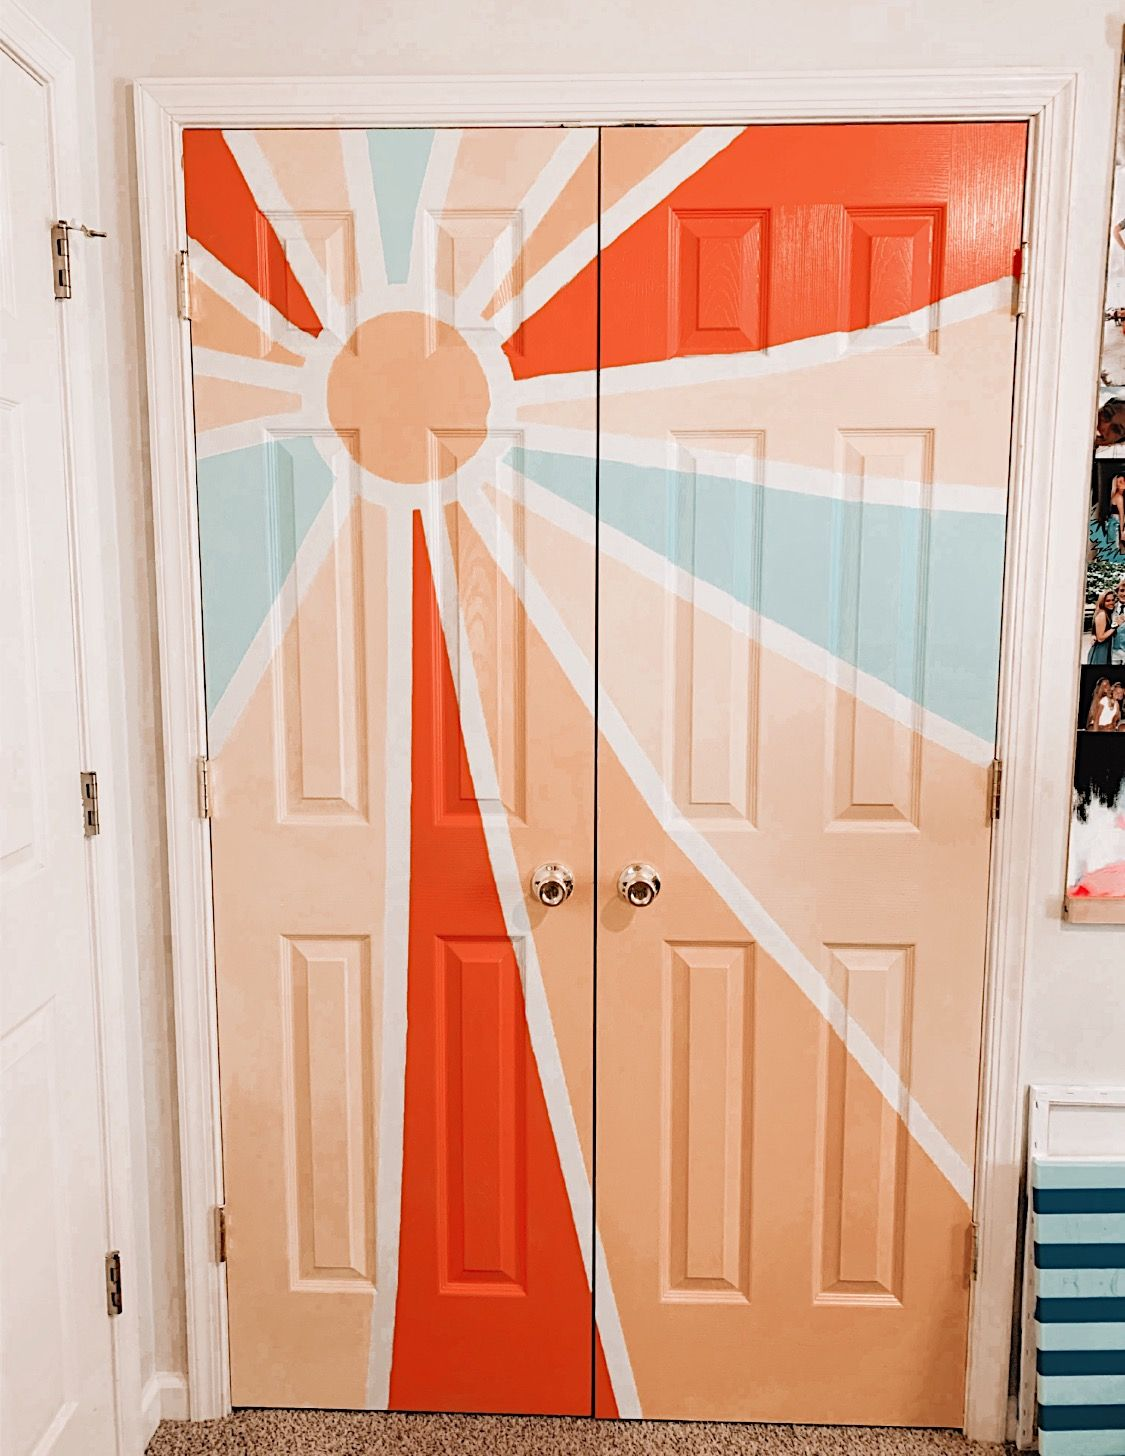 Alexdeannn Pureluxuriess Painted Bedroom Doors Closet Doors Painted Bedroom Art Painting